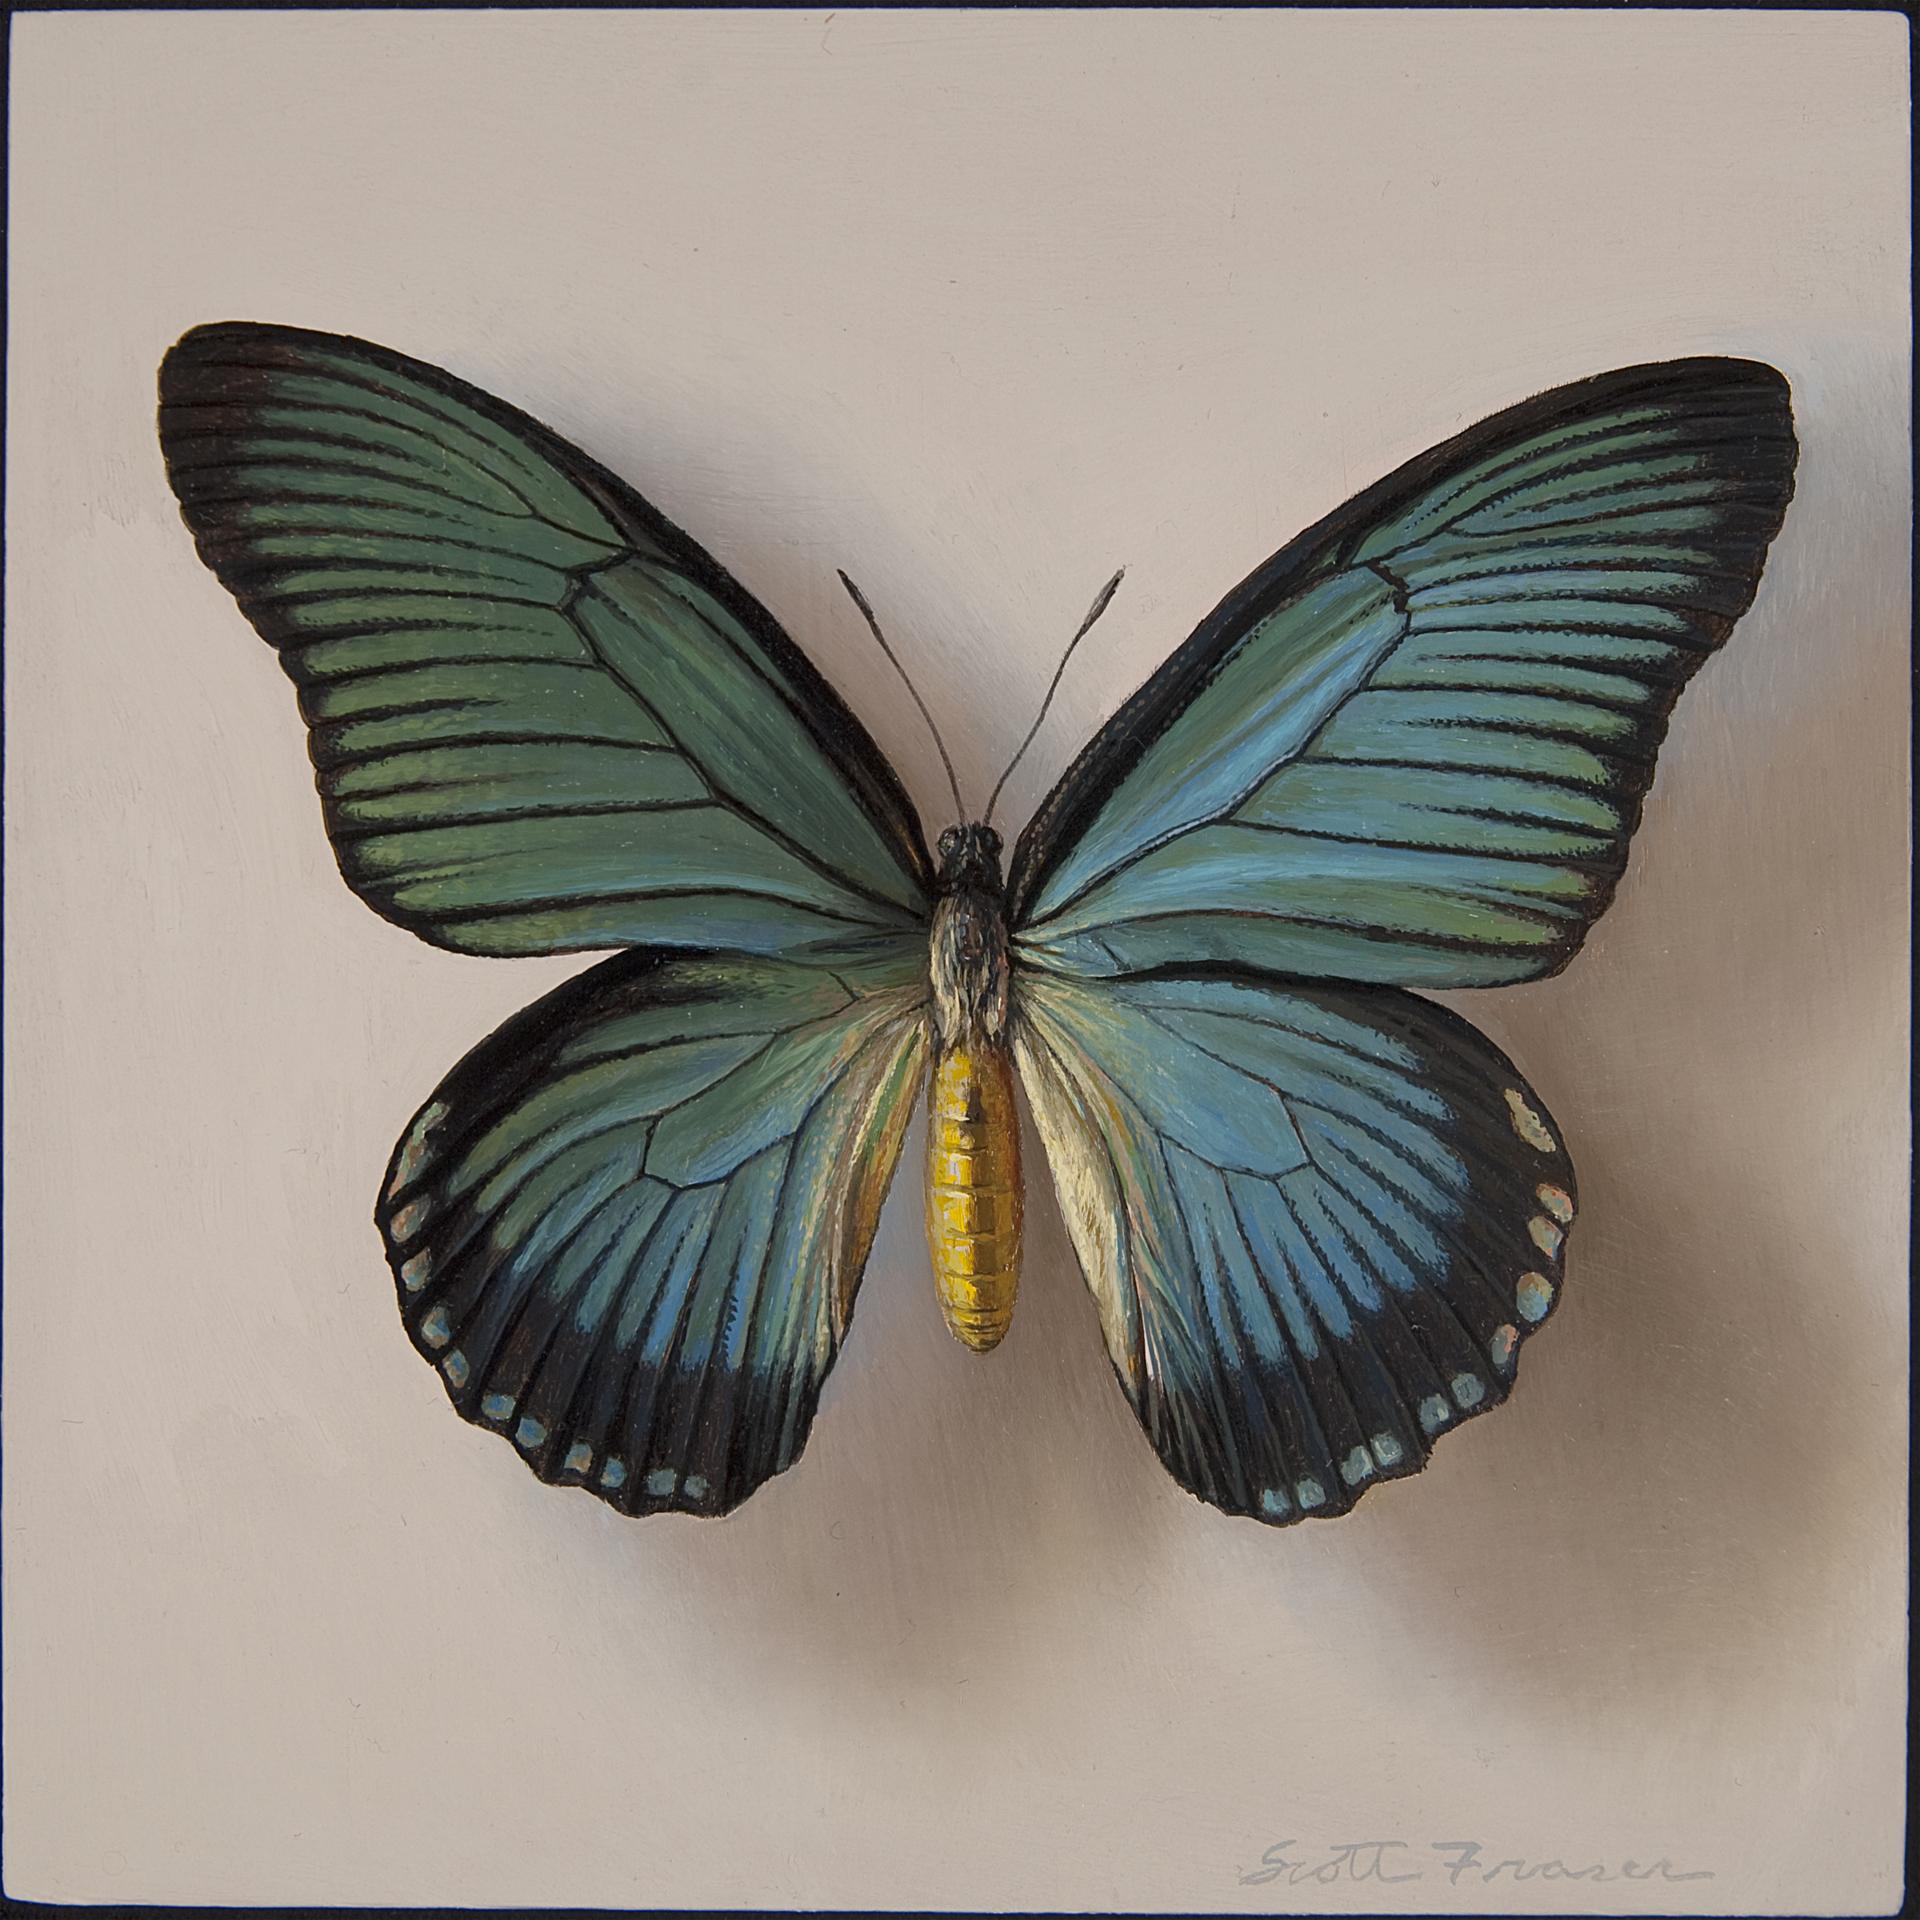 Butterfly by Scott Fraser